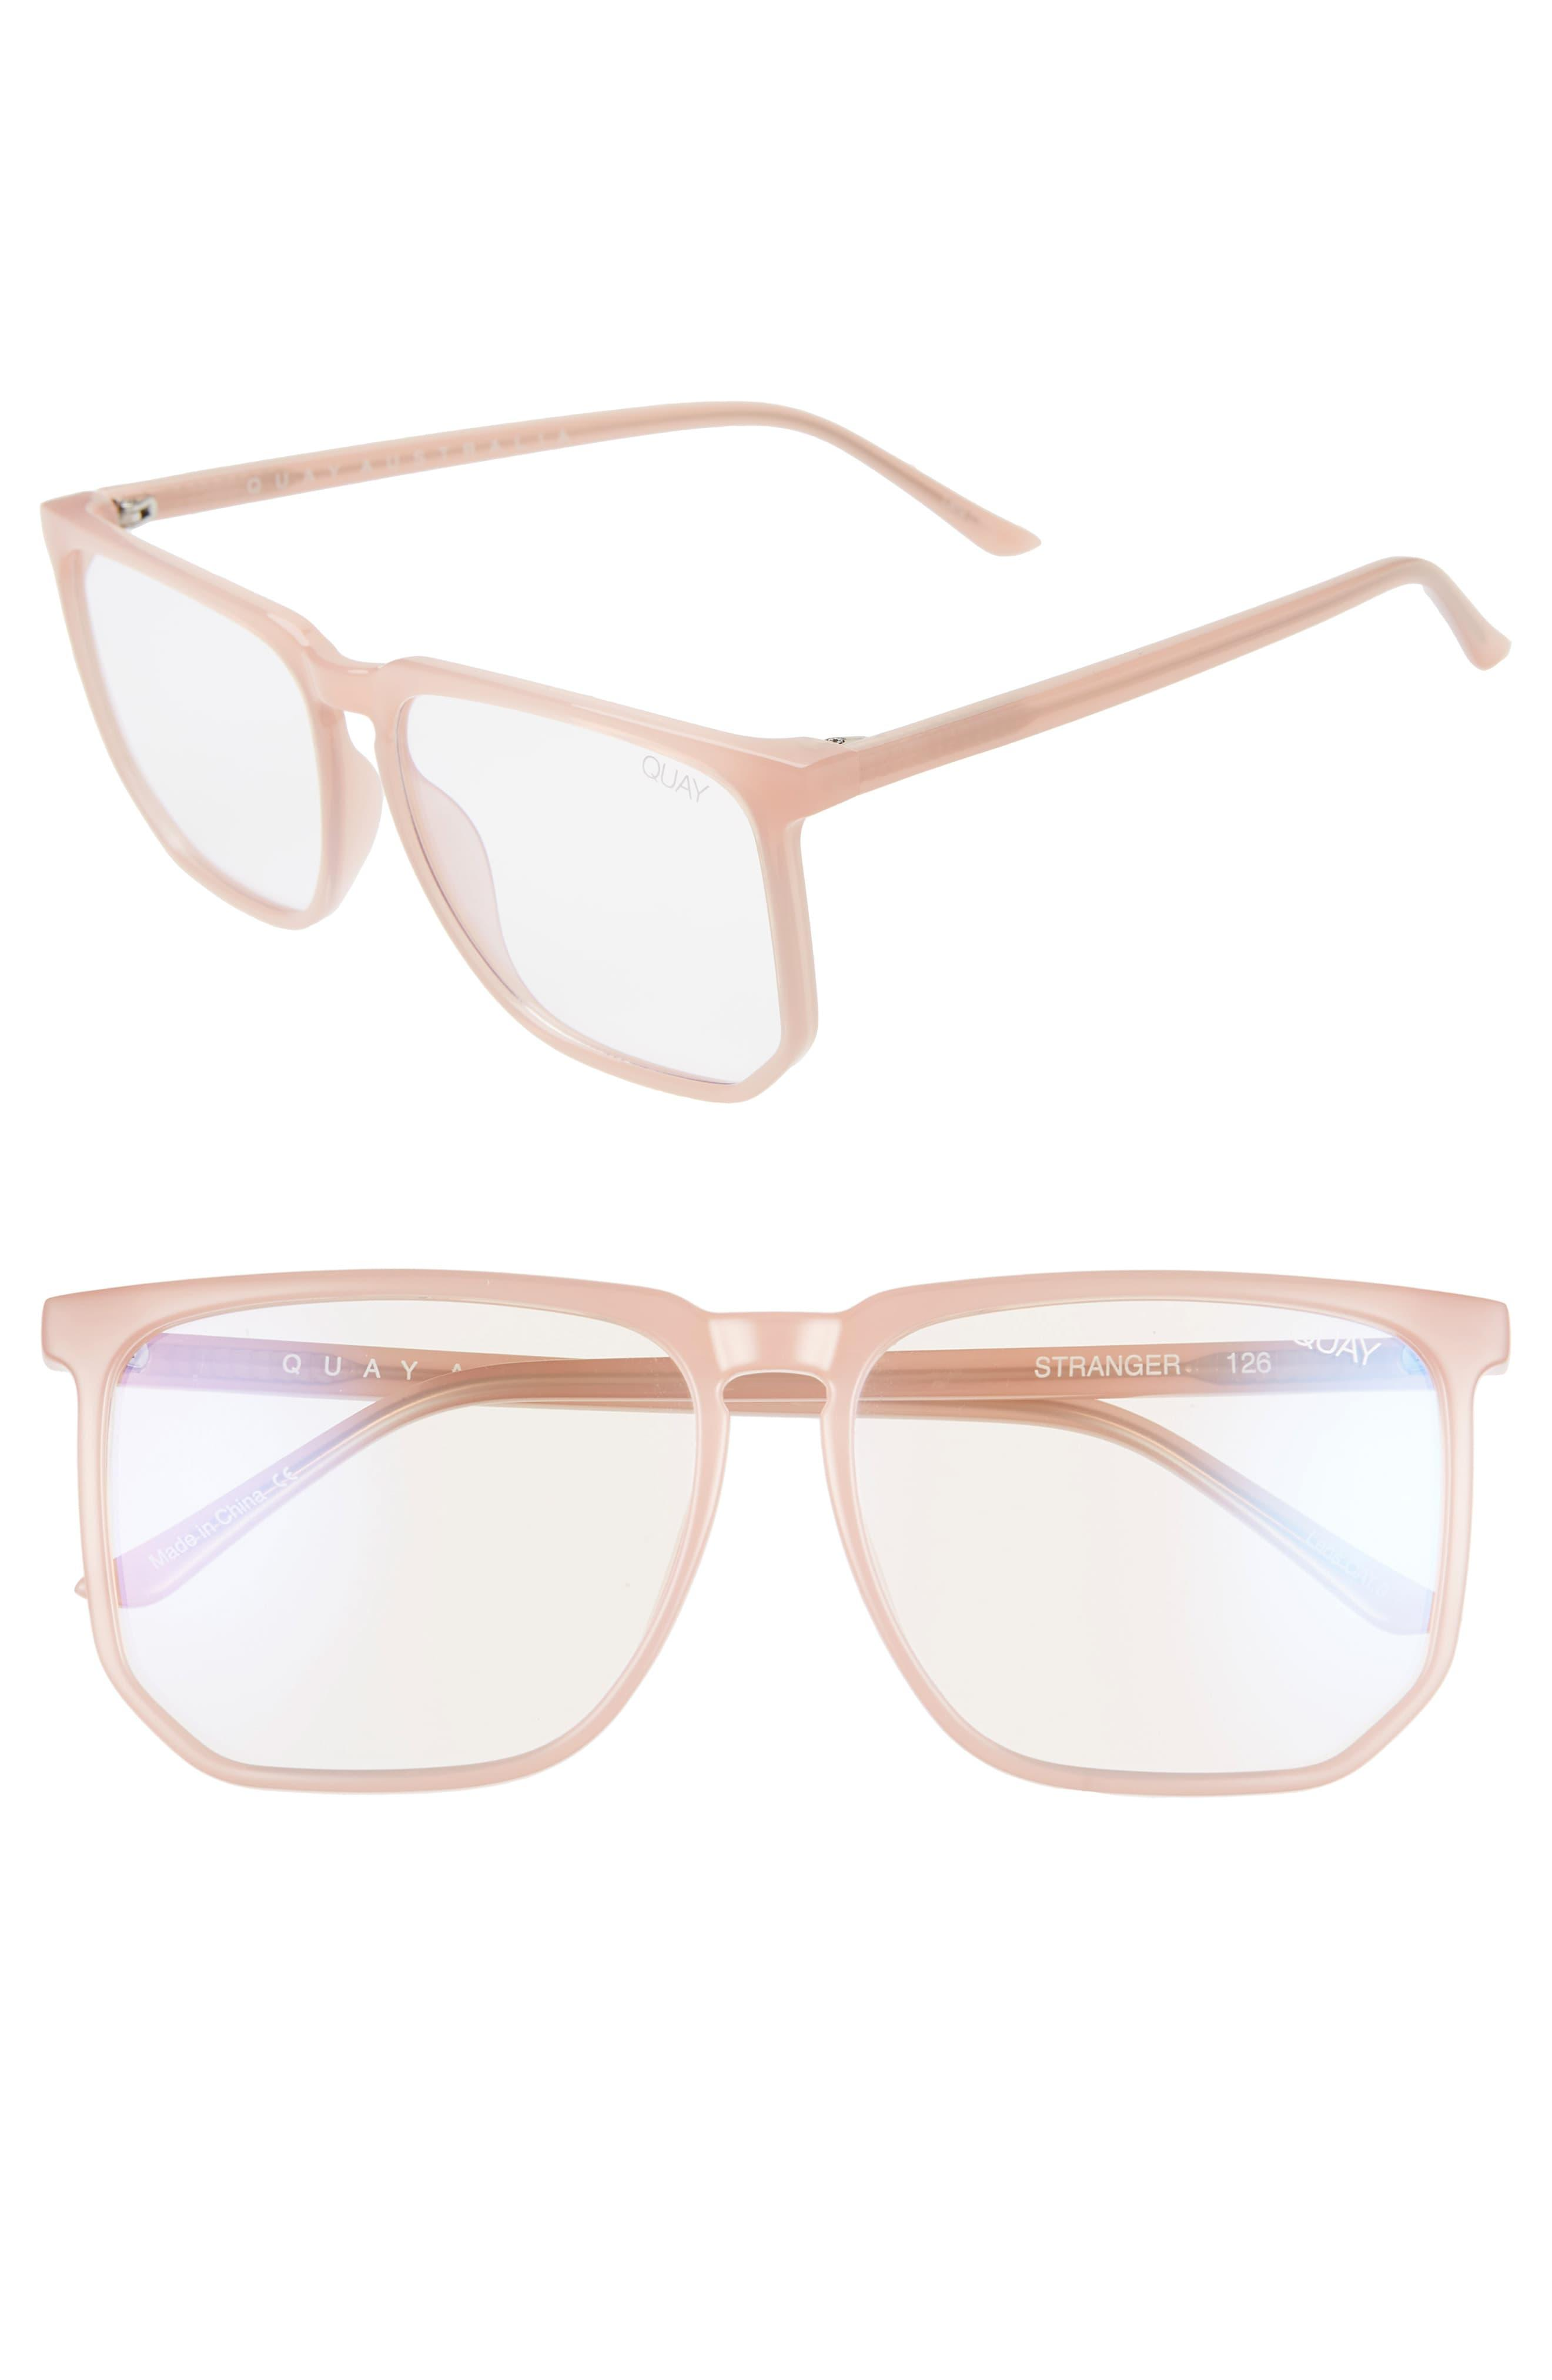 acf62048bf Quay Stranger 52mm Blue Light Blocking Glasses in Pink - Lyst